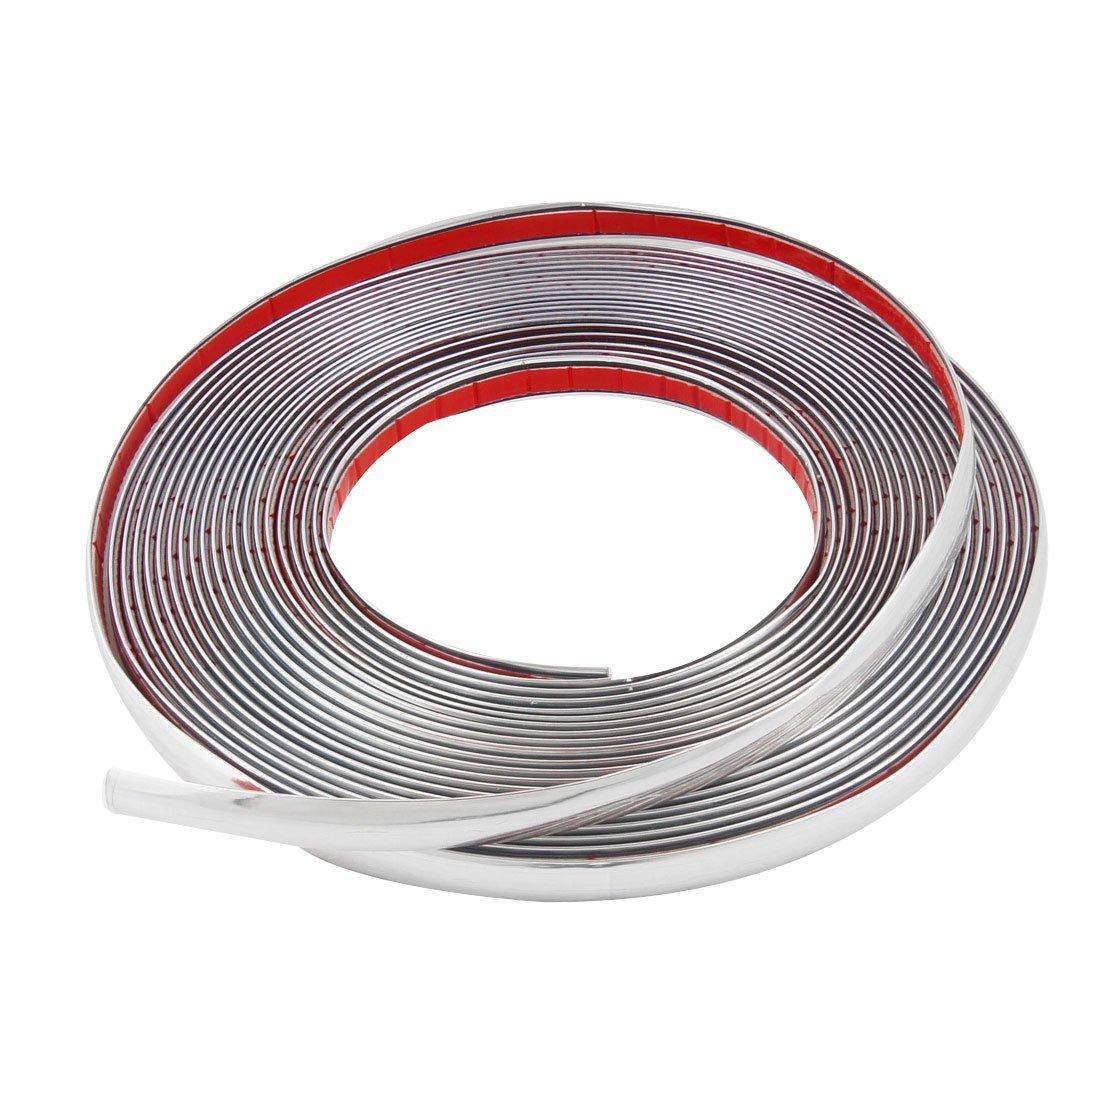 uxcell 15M x15mm Flexible Silver Tone Moulding Trim Strip Decor for Car Auto